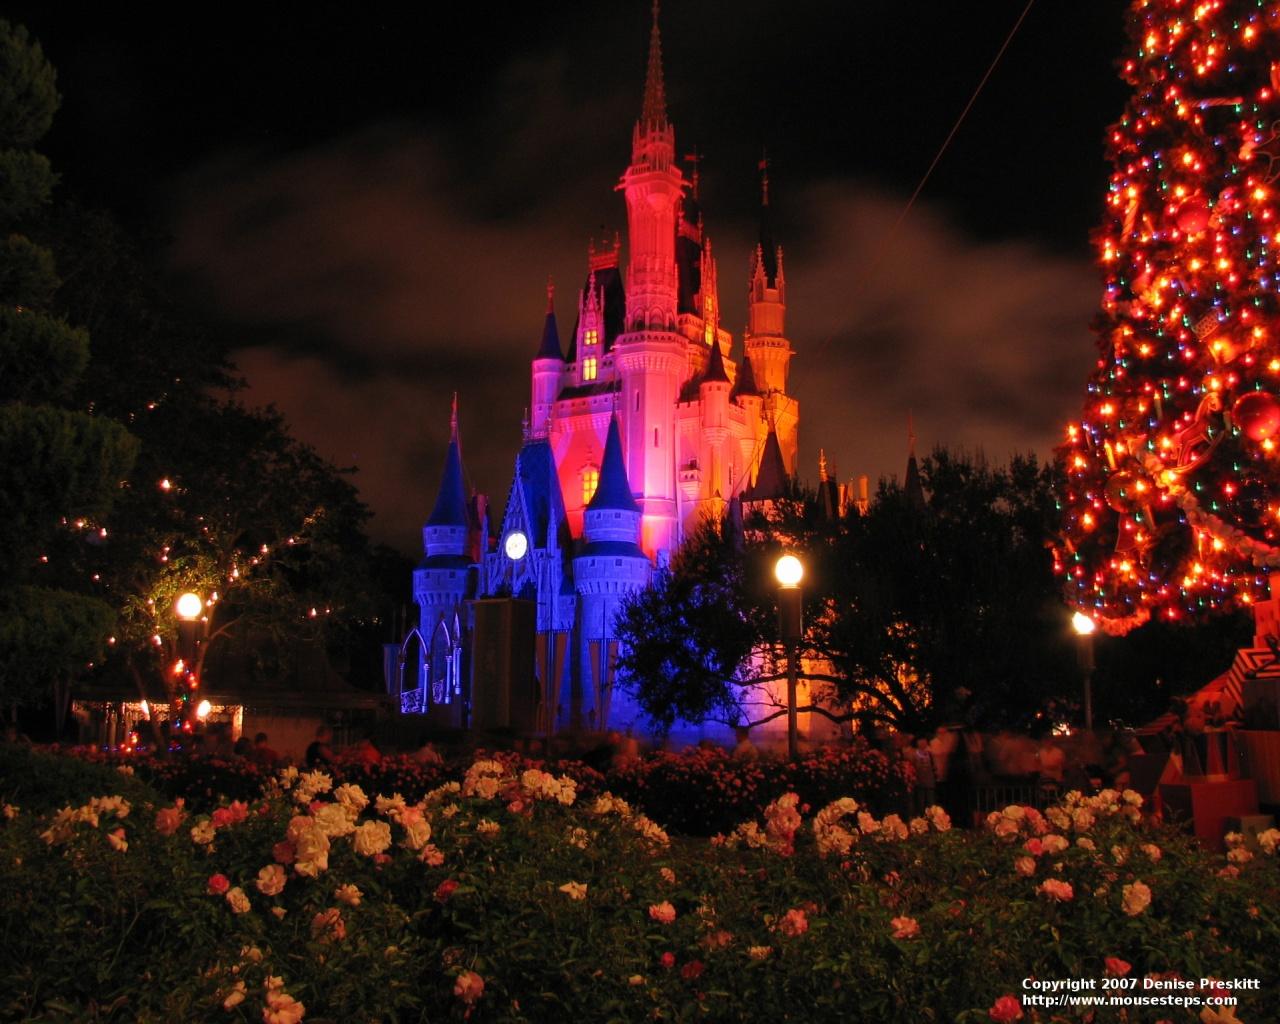 Desktop Wallpaper Christmas Photos From Walt Disney World Mousesteps